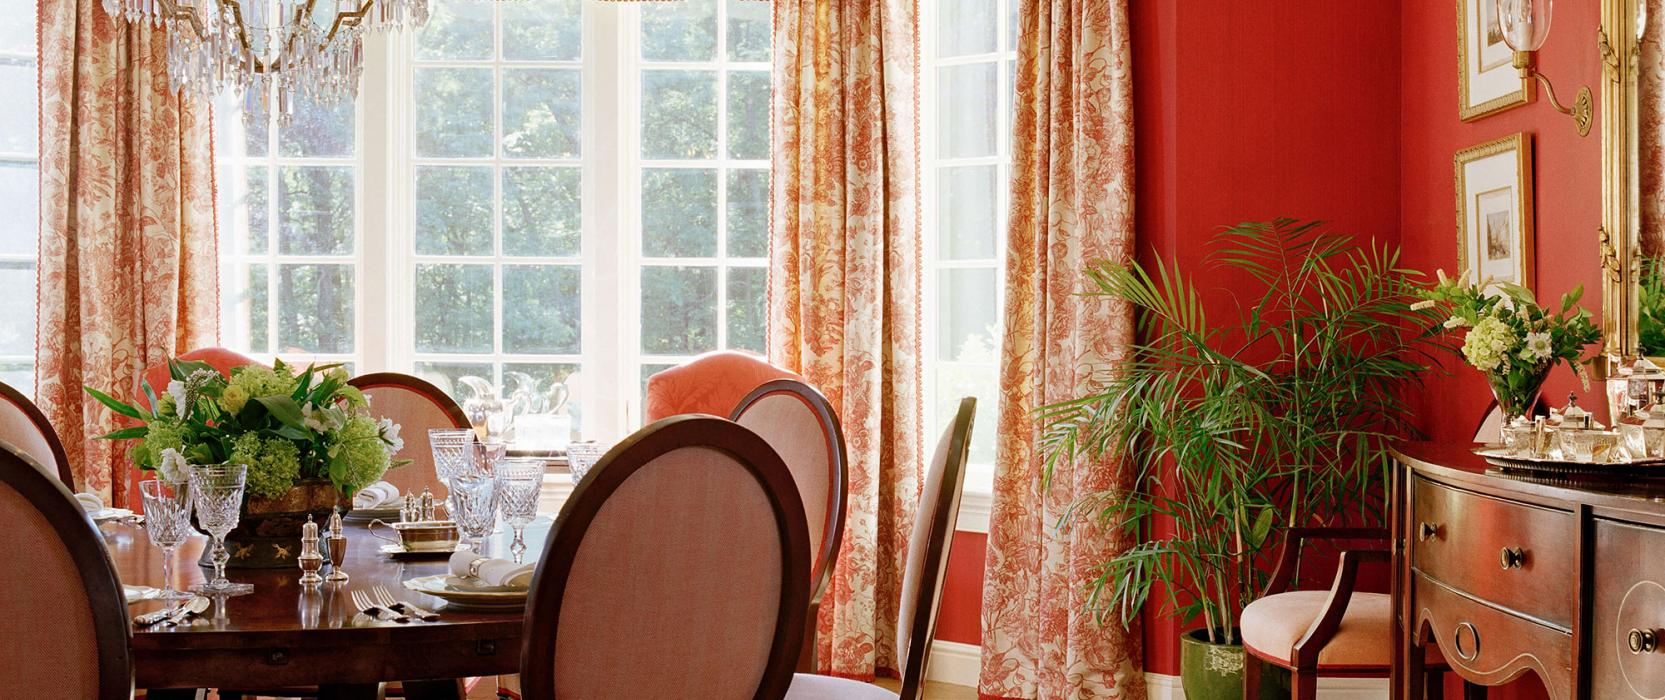 Alluring Dining Room Table Design